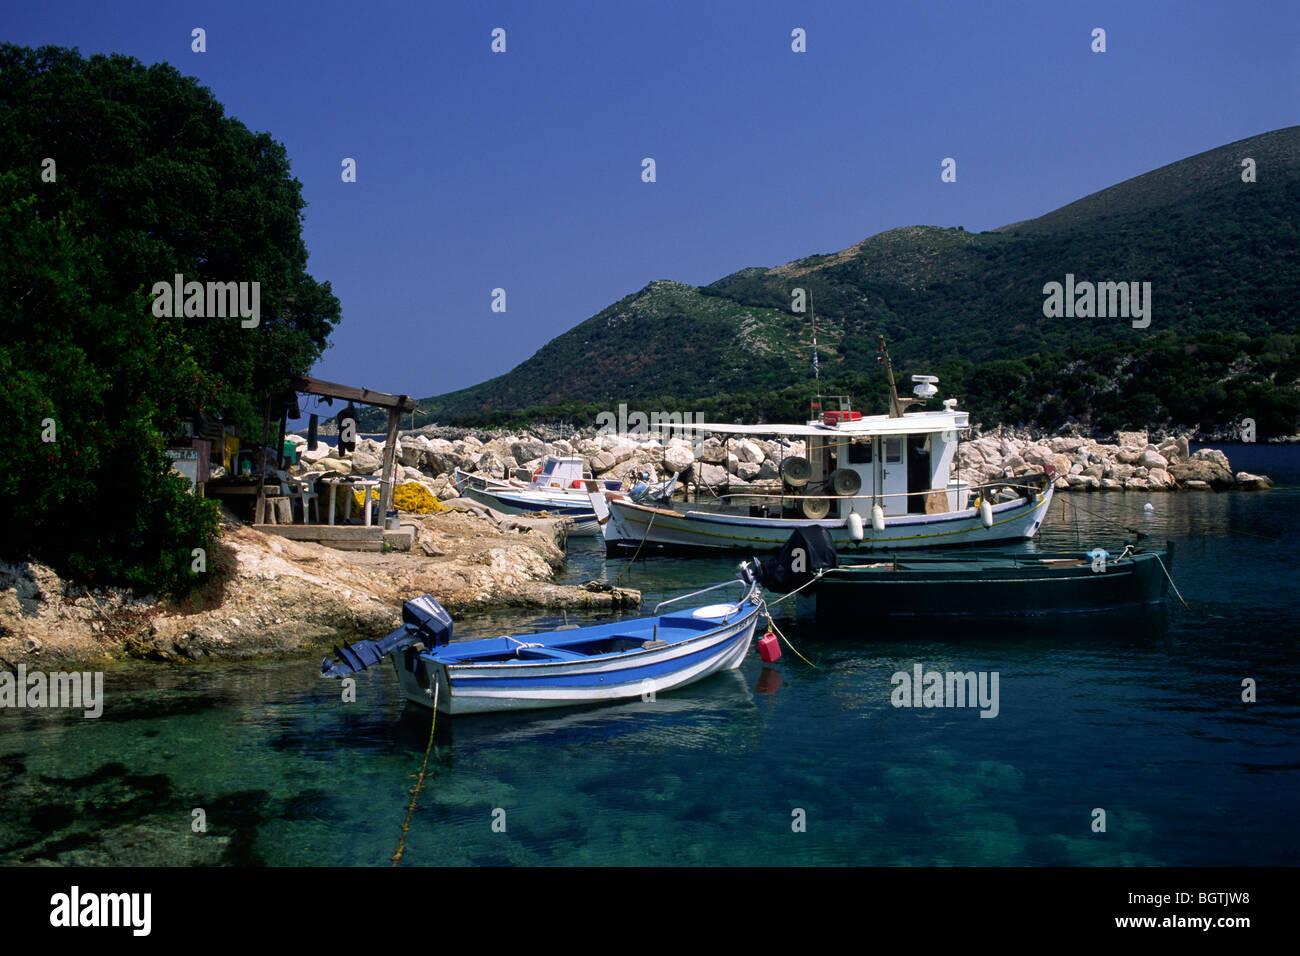 greece, ionian islands, kefalonia, atheras - Stock Image